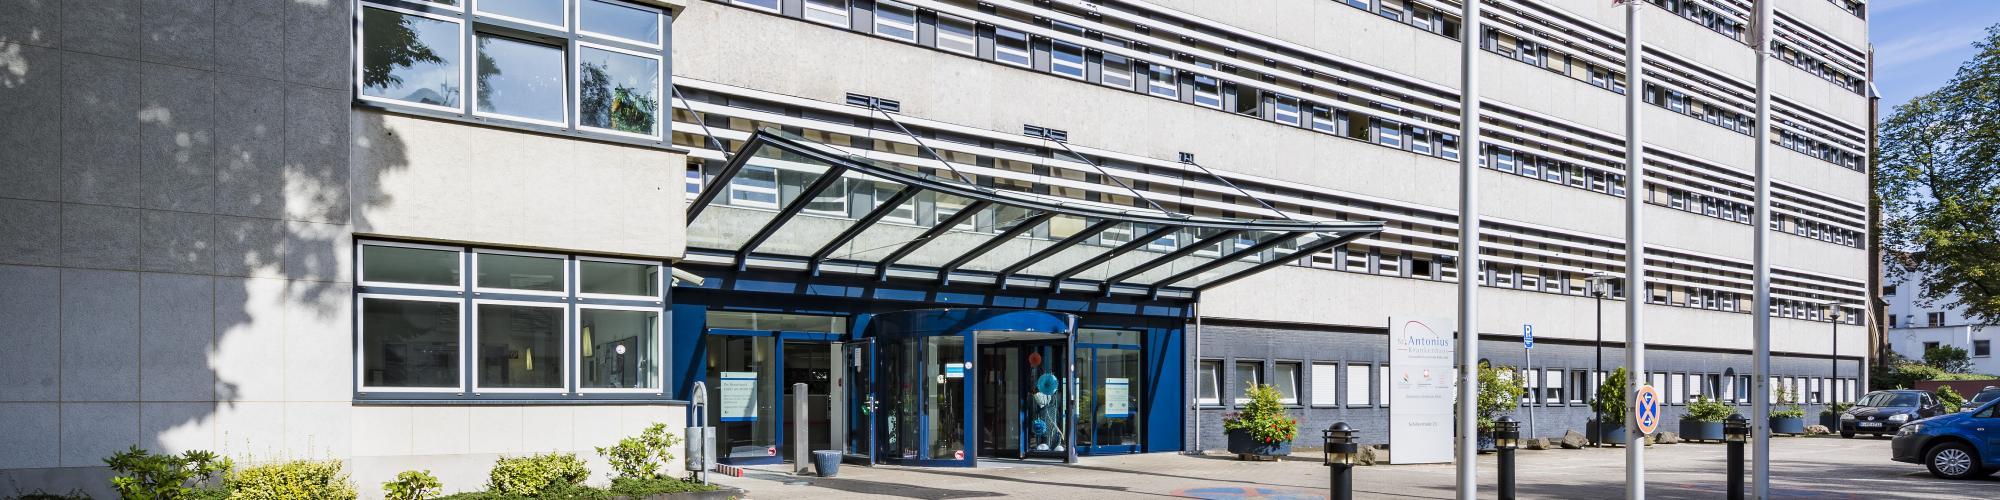 St. Antonius Krankenhaus Köln